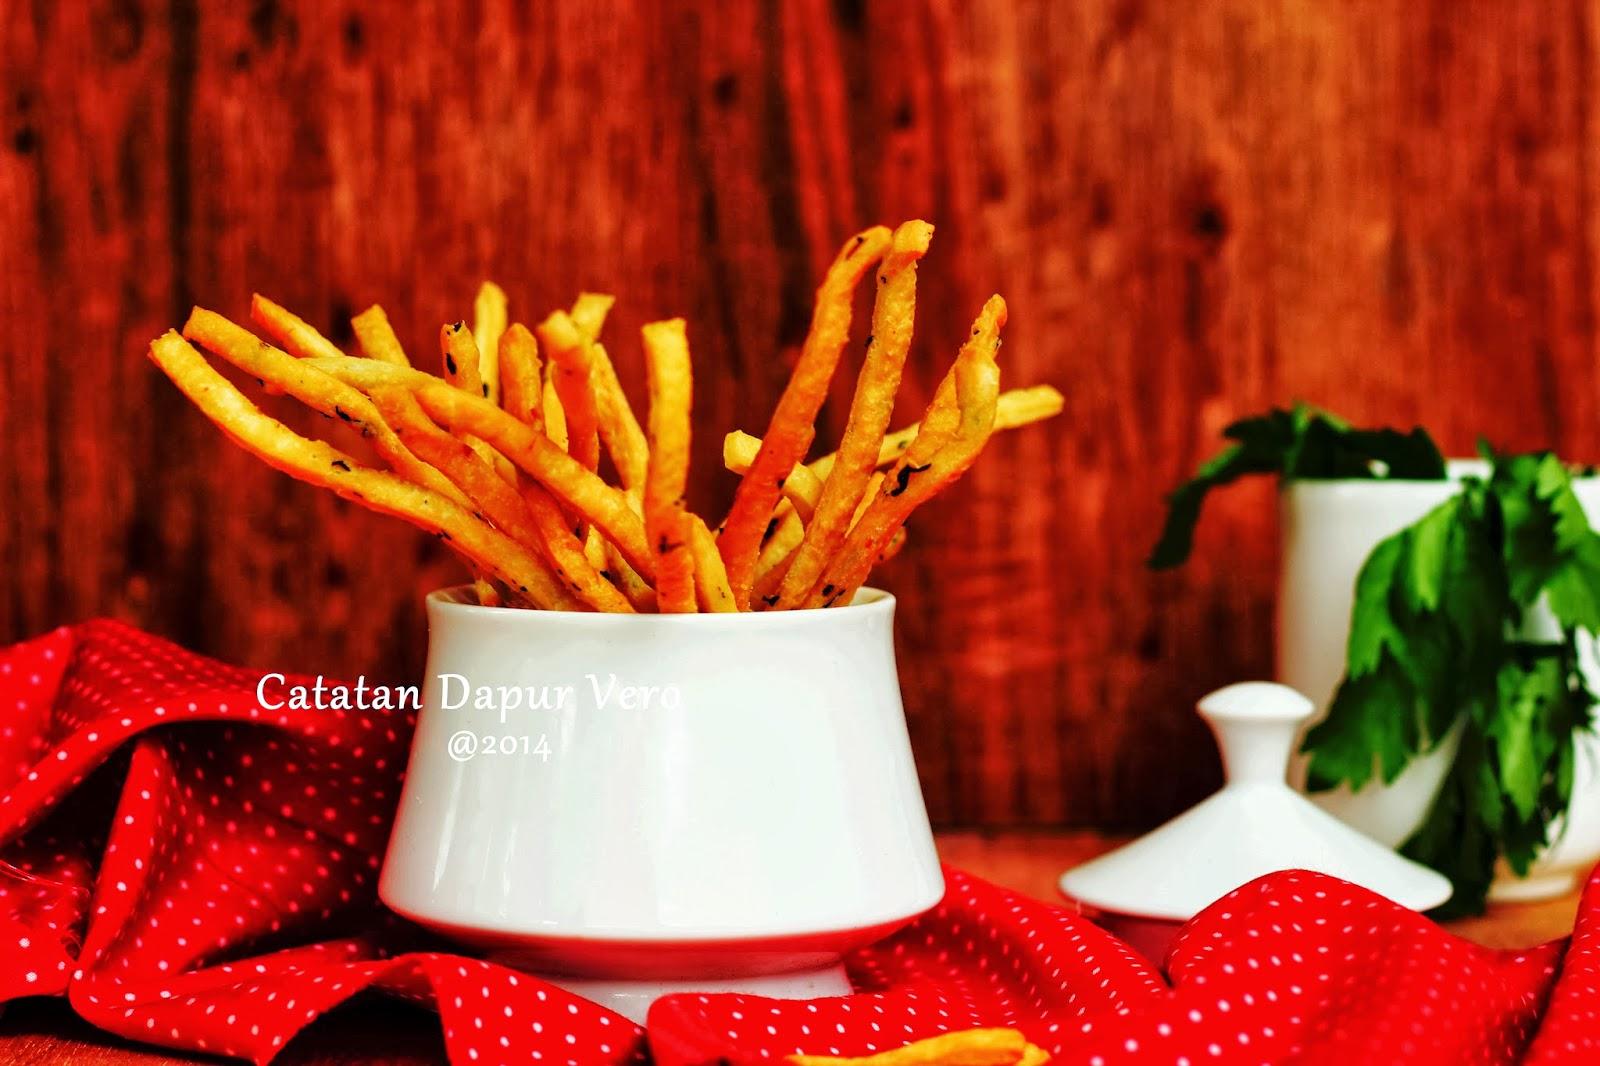 resep stik bawang rumput laut